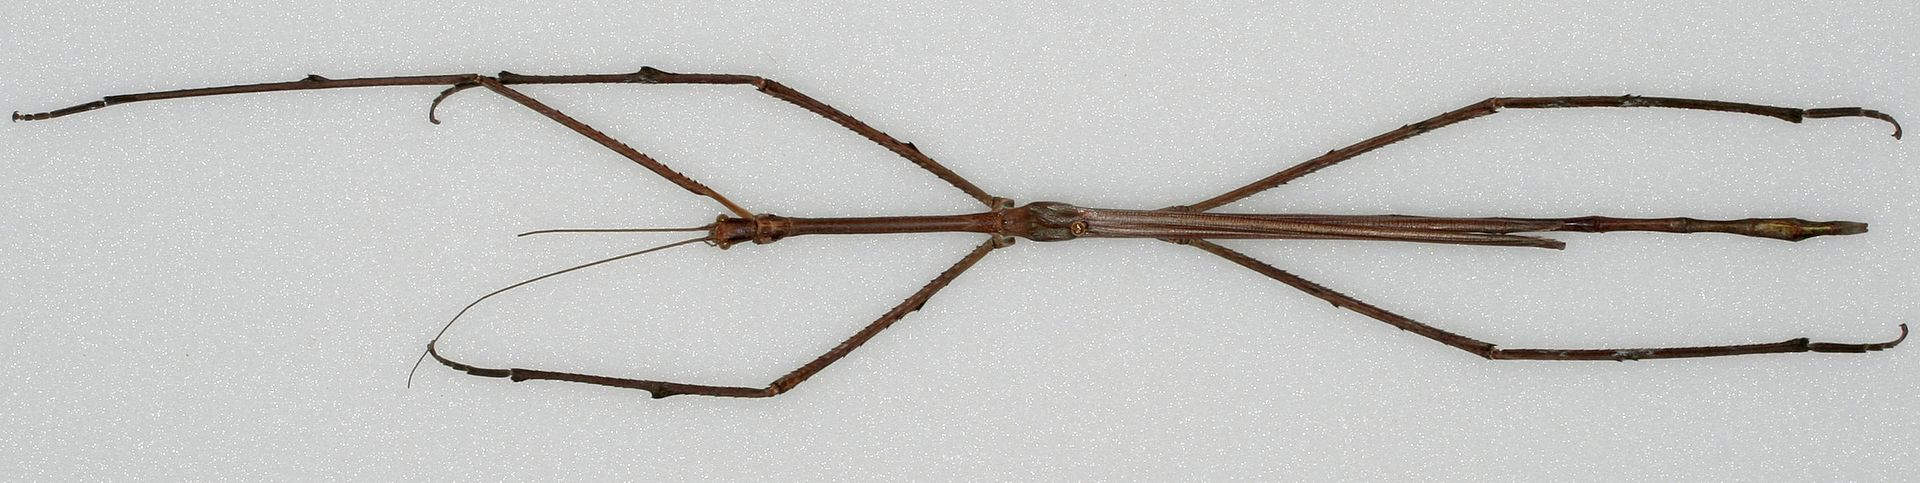 Phobaeticus chani